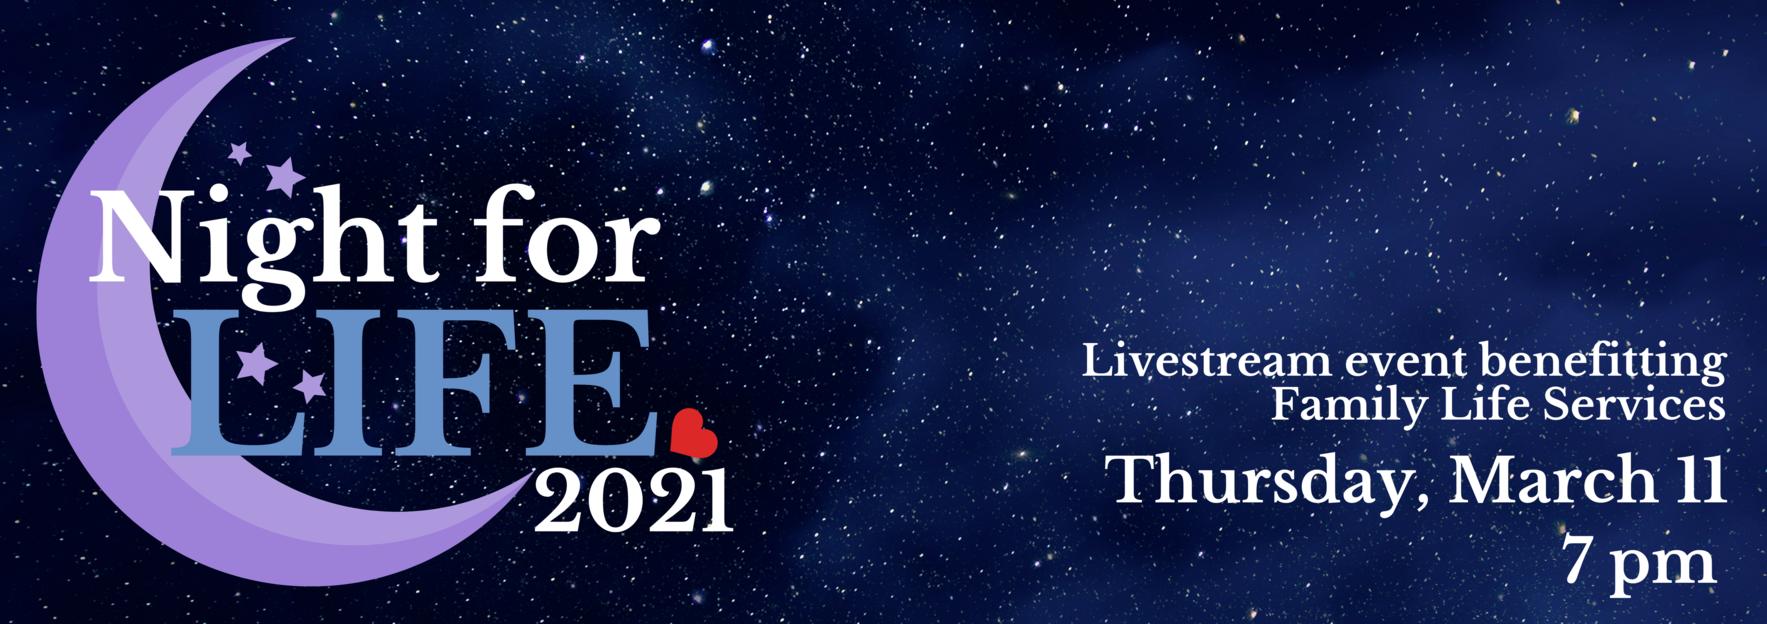 Night for Life Registration image